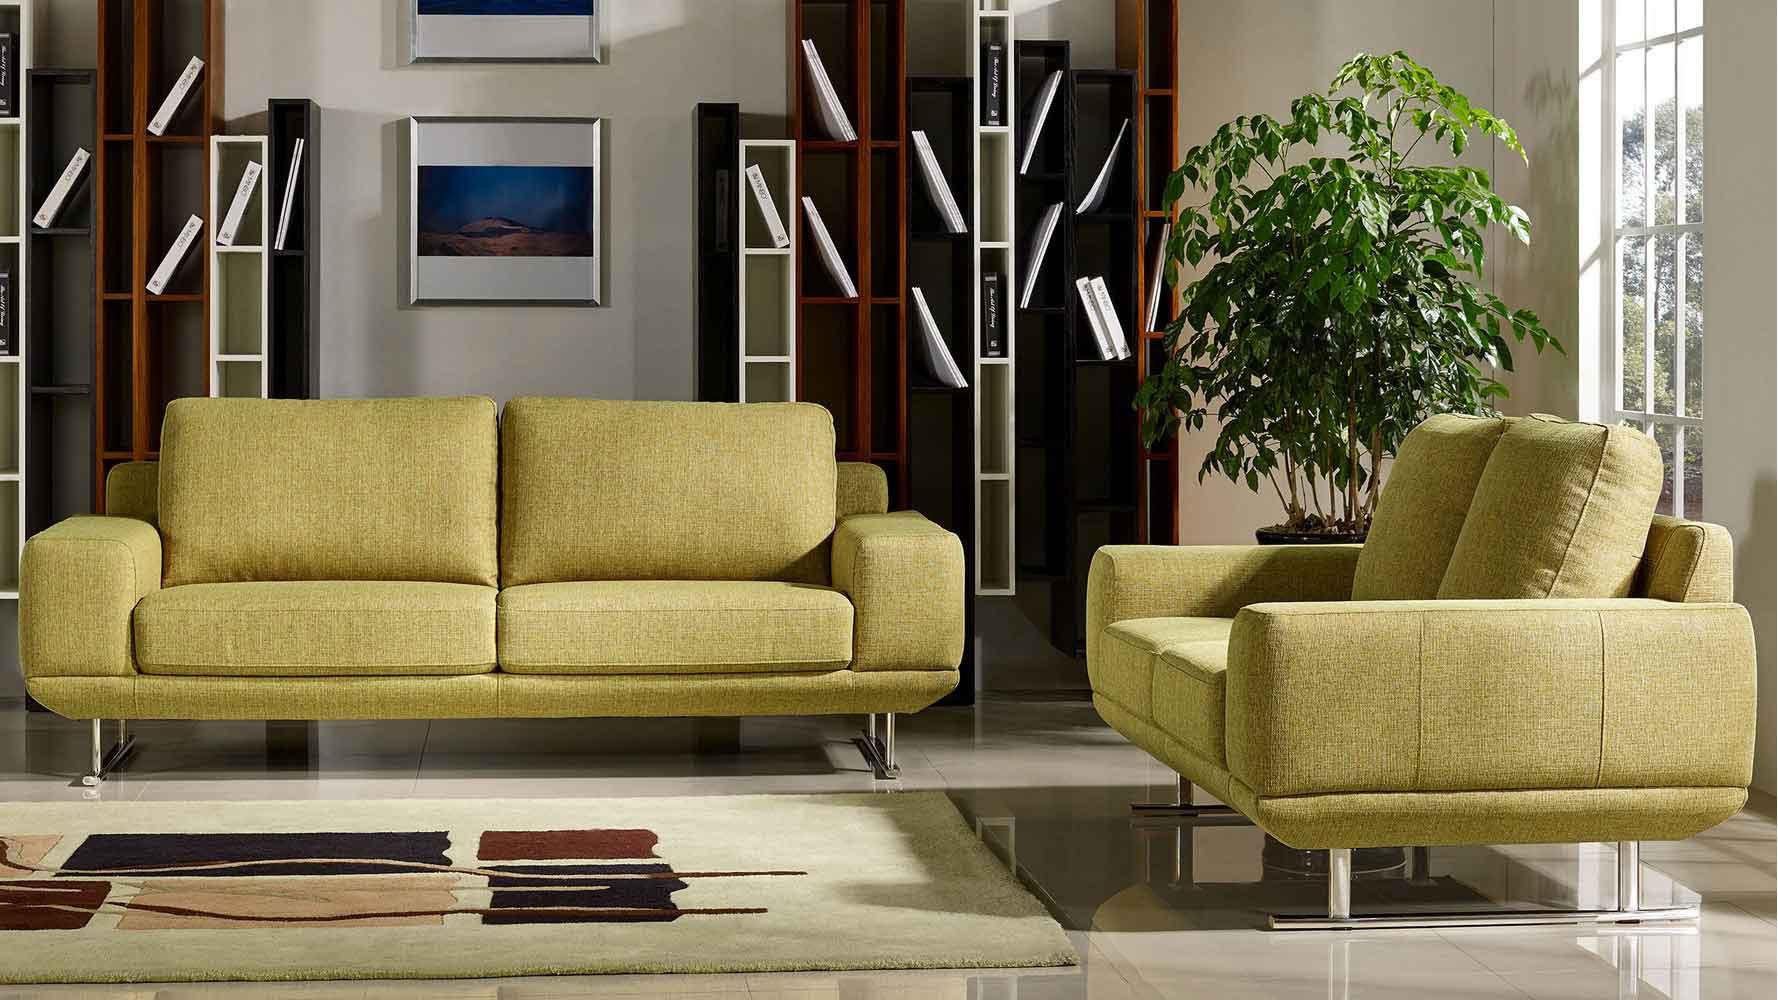 Modern Chartreuse Fabric Della Sofa and Loveseat Set ...